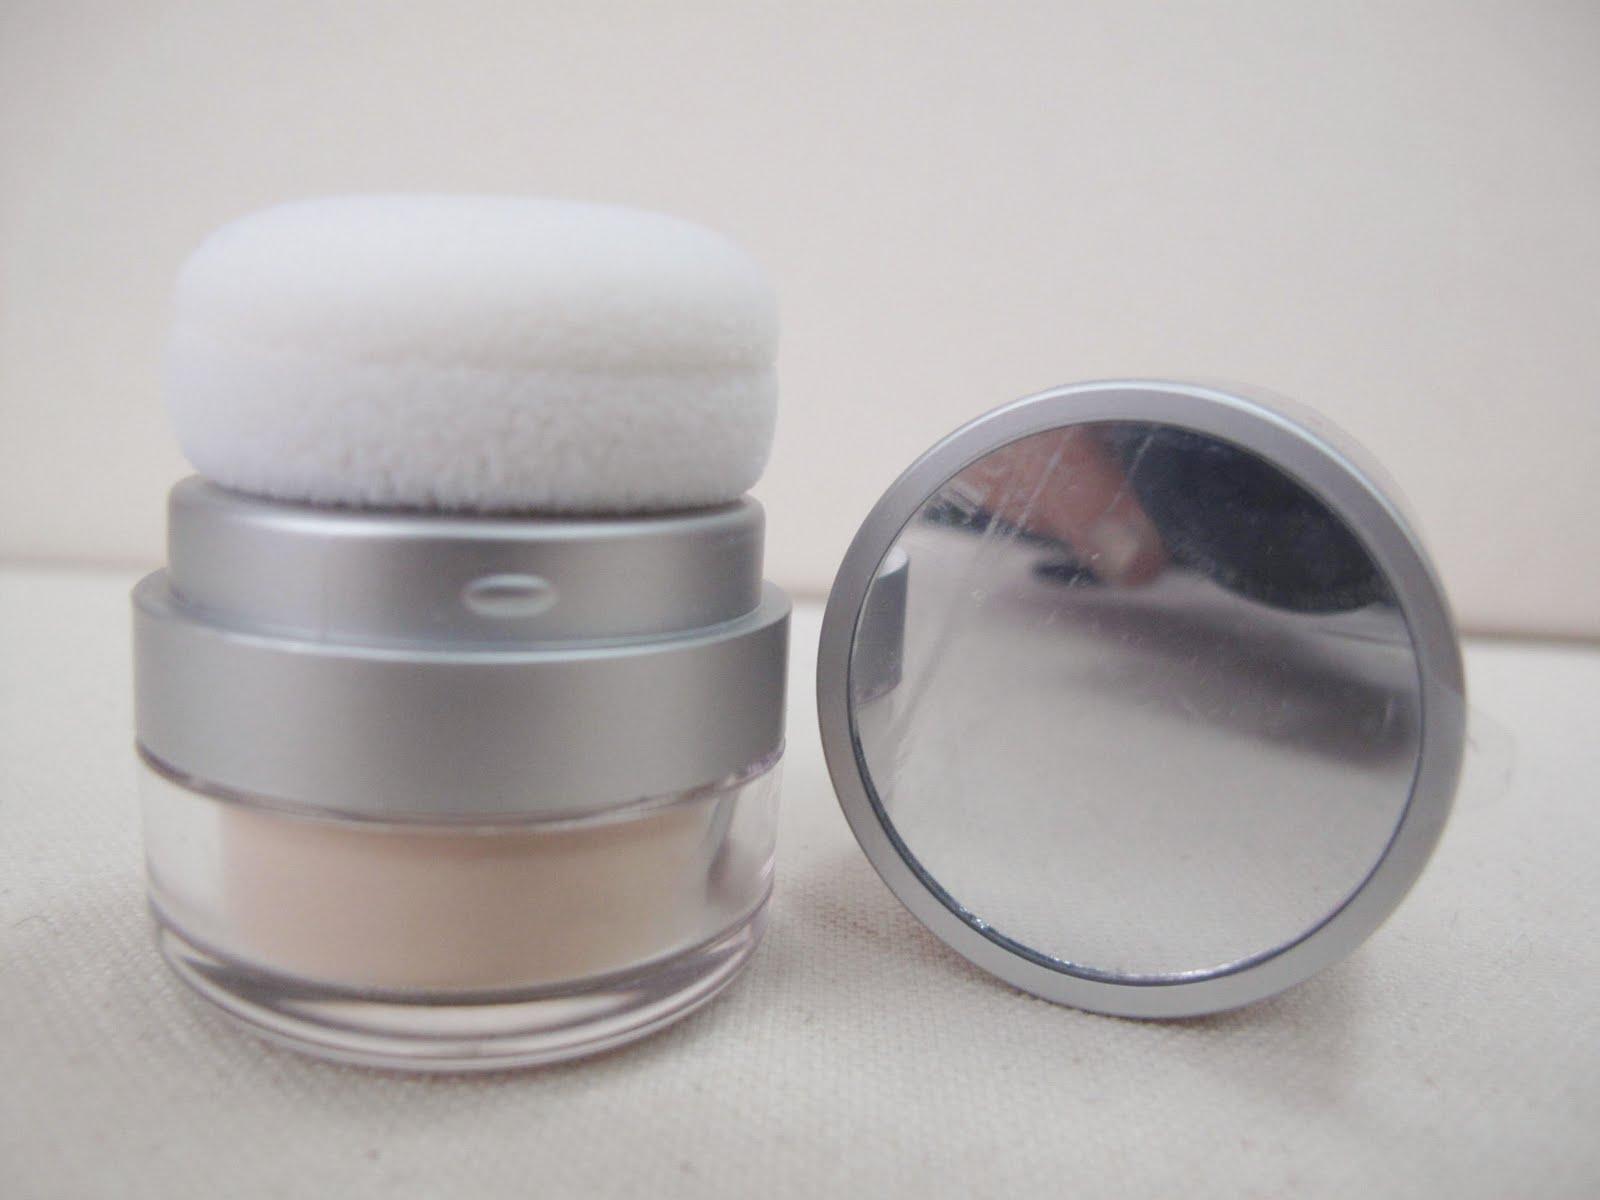 doctor kits foundation bb cream powder